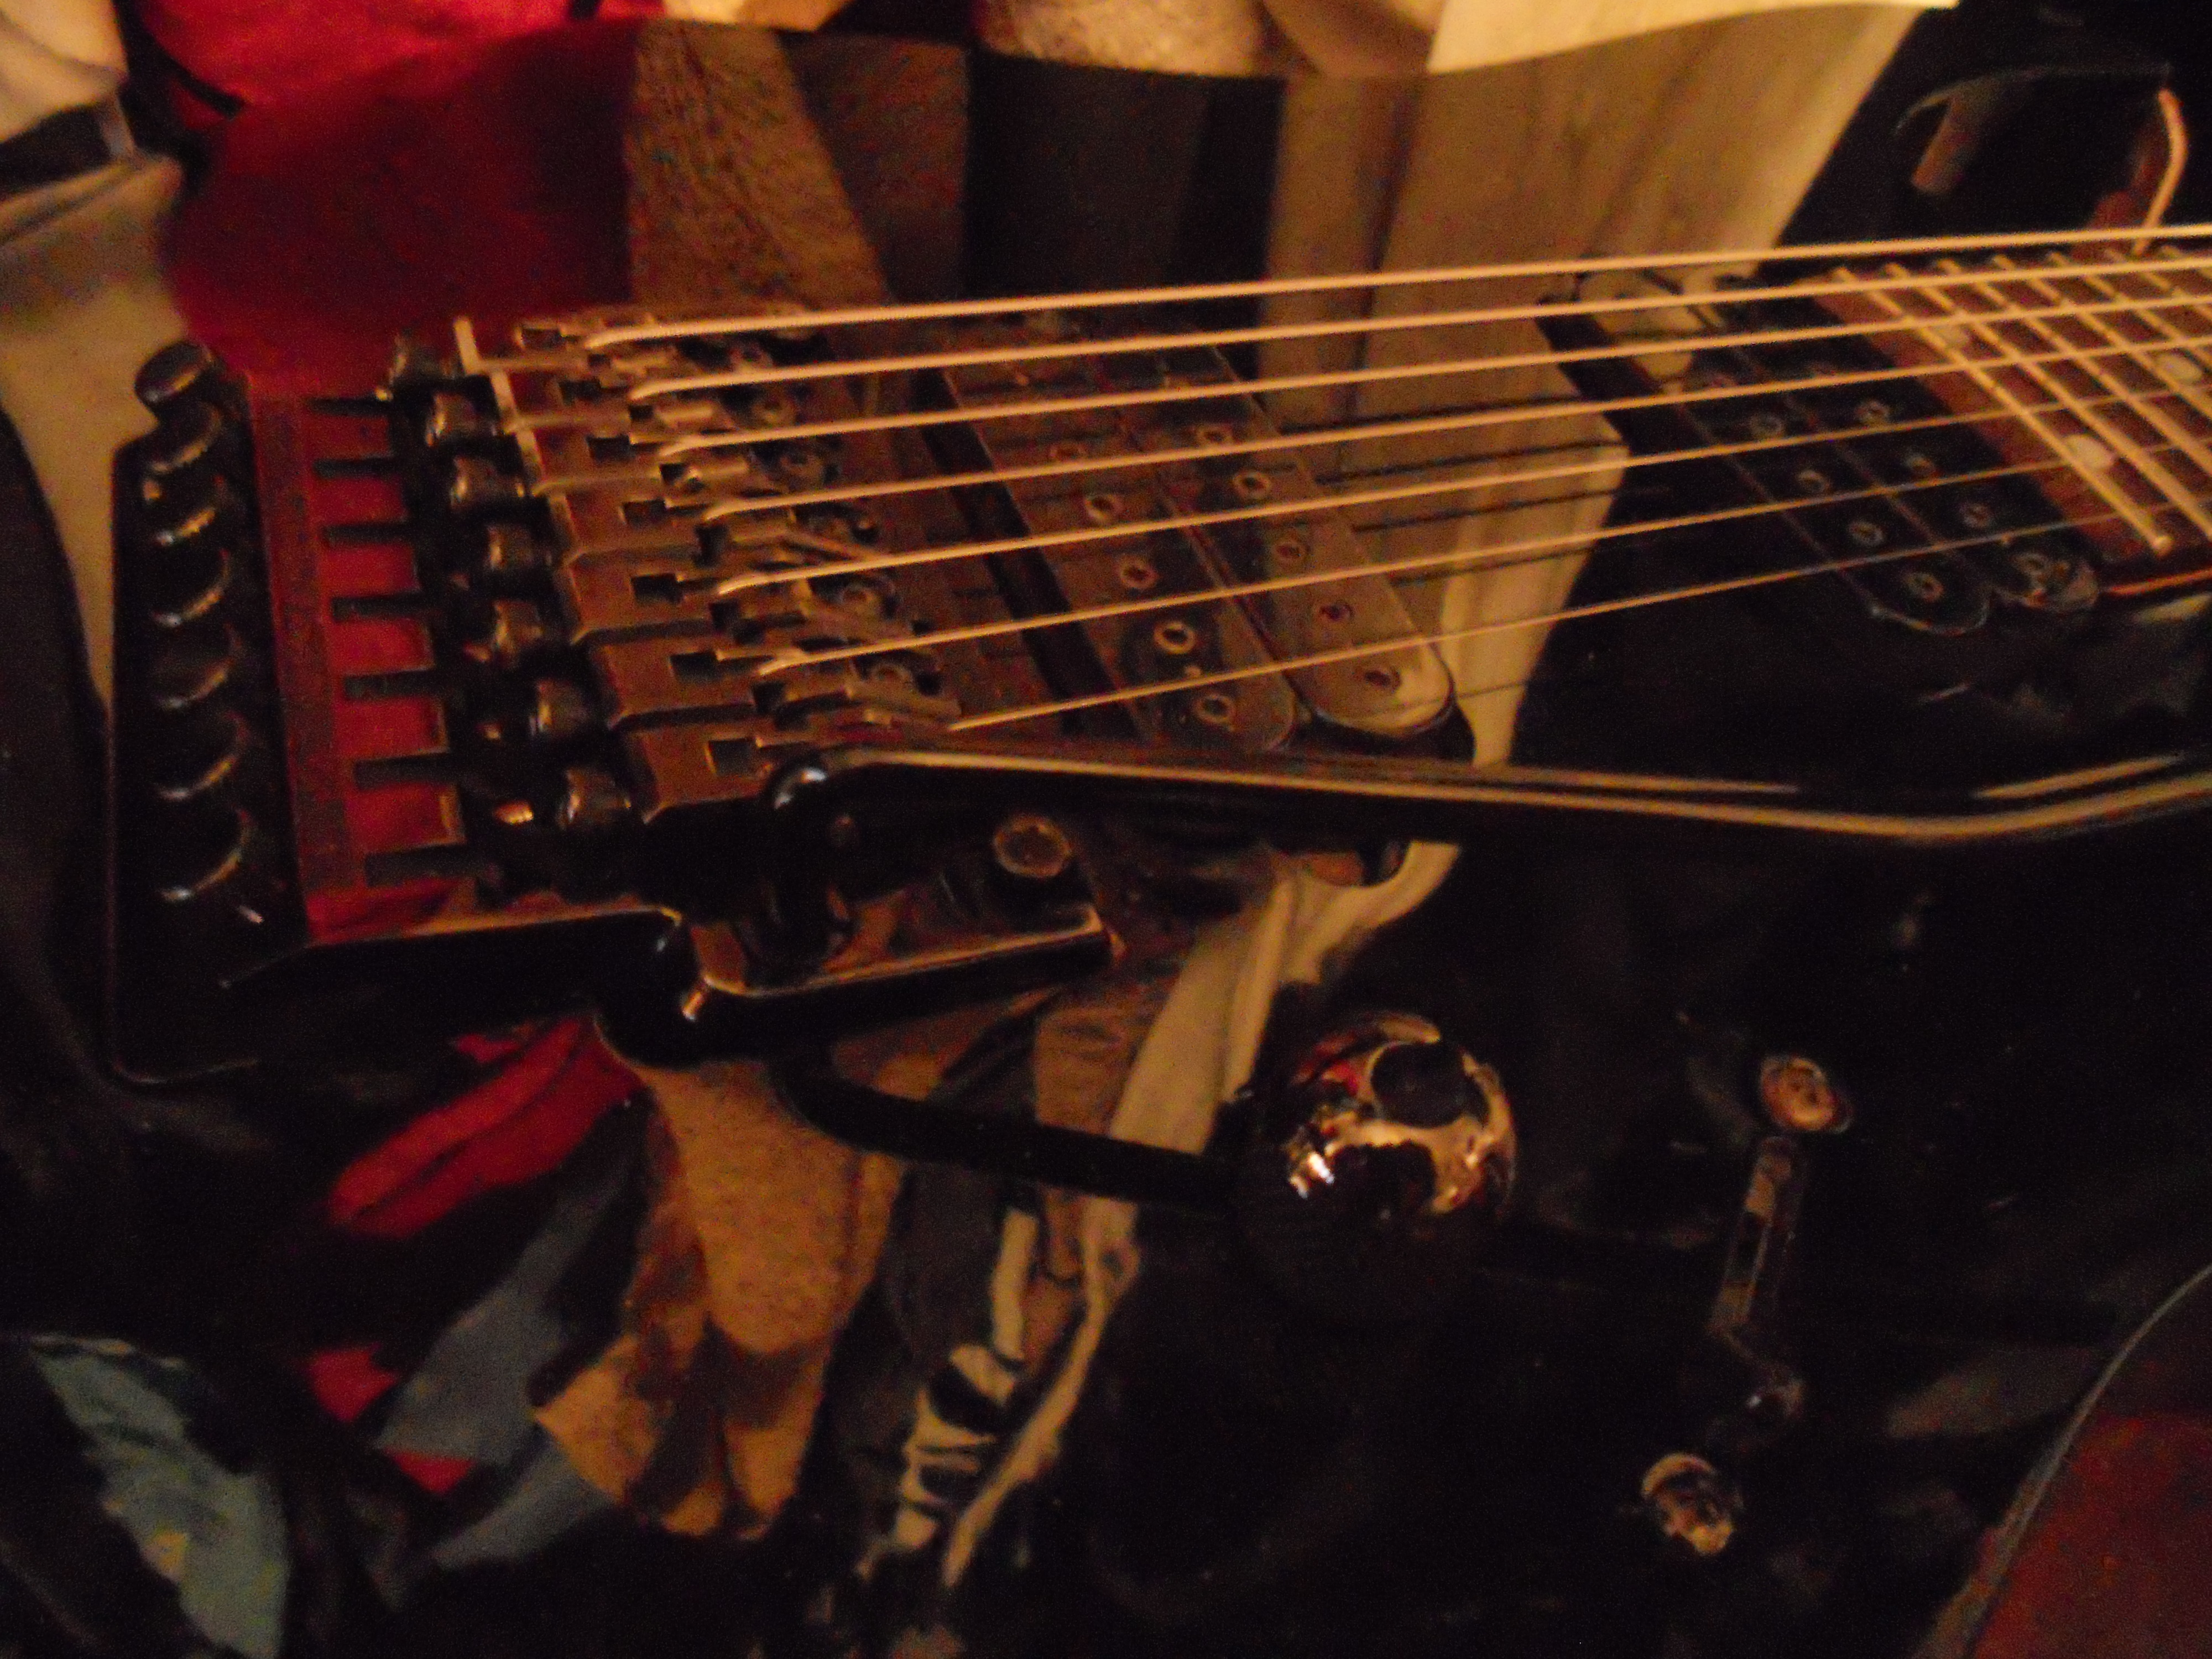 File:Seven strings guitar with tremolo floating bridge JPG